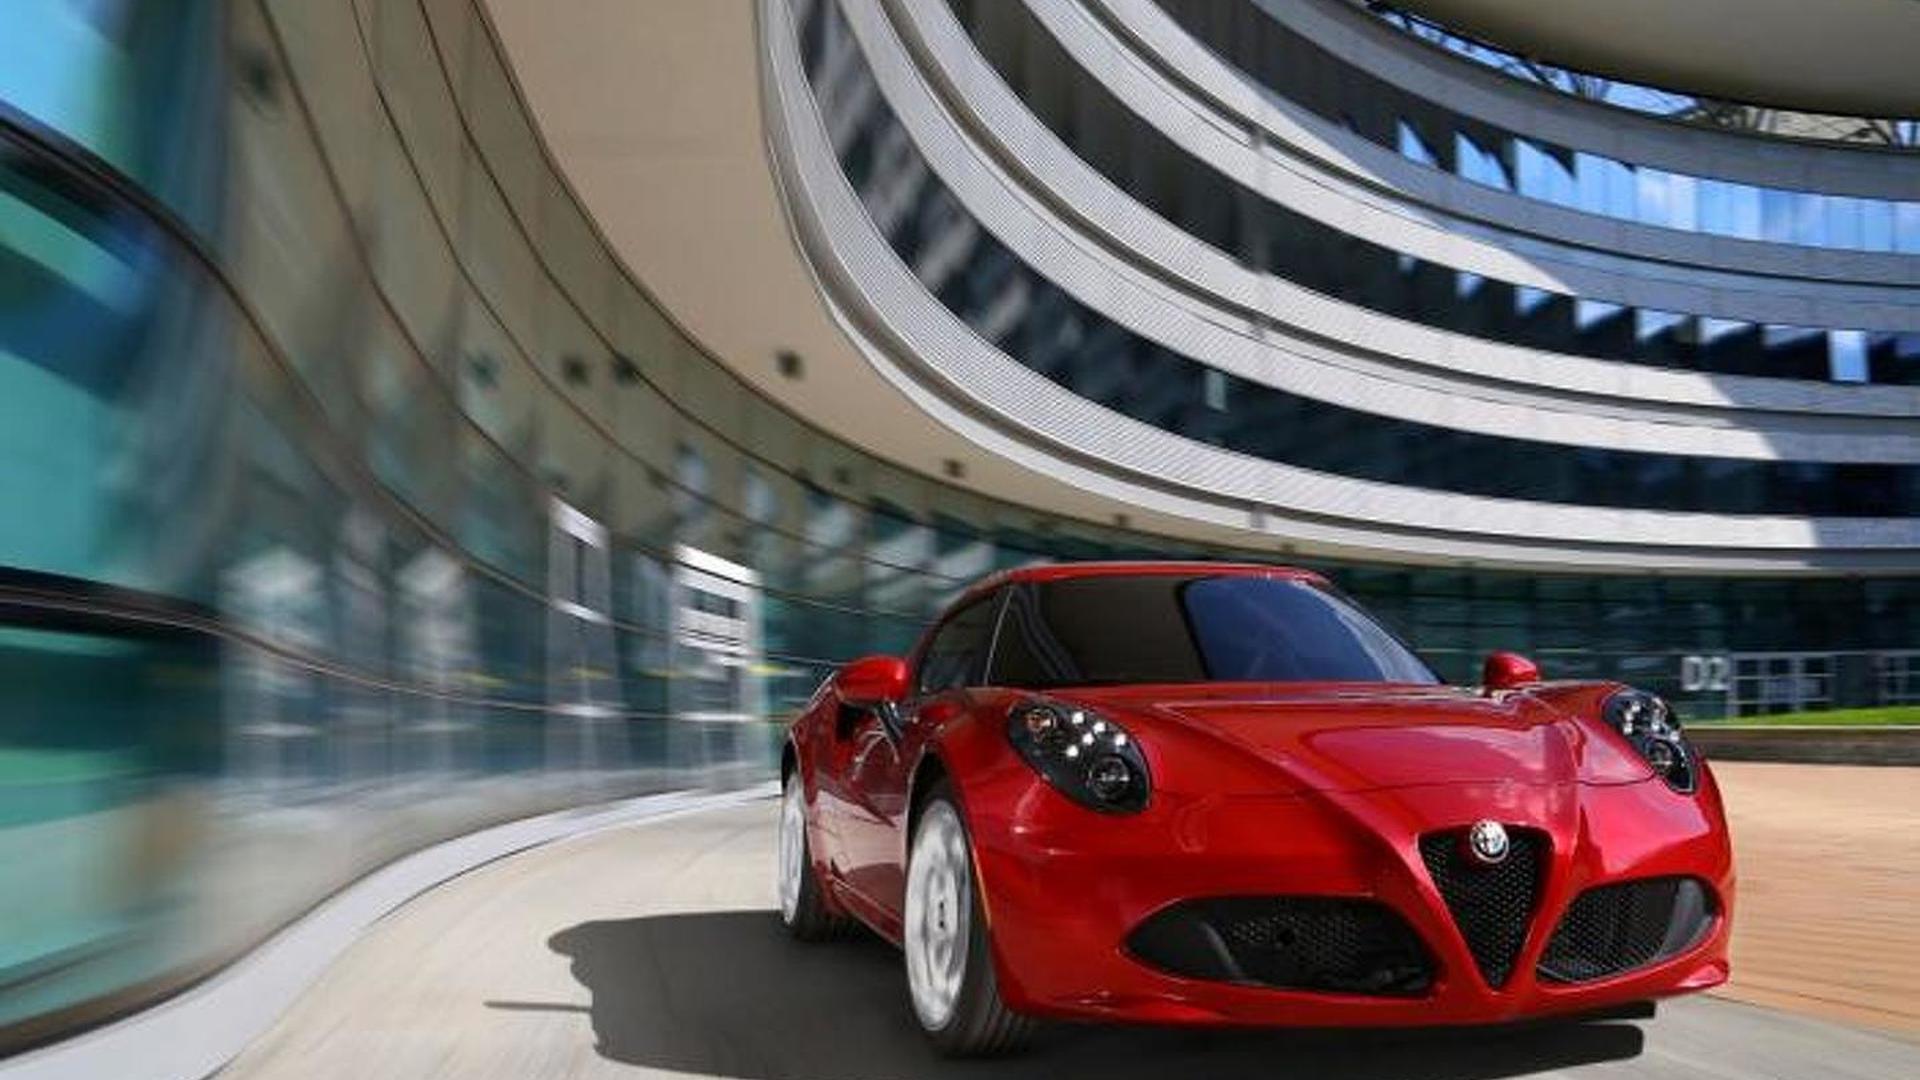 Alfa Romeo 4C plays its raspy soundtrack on video